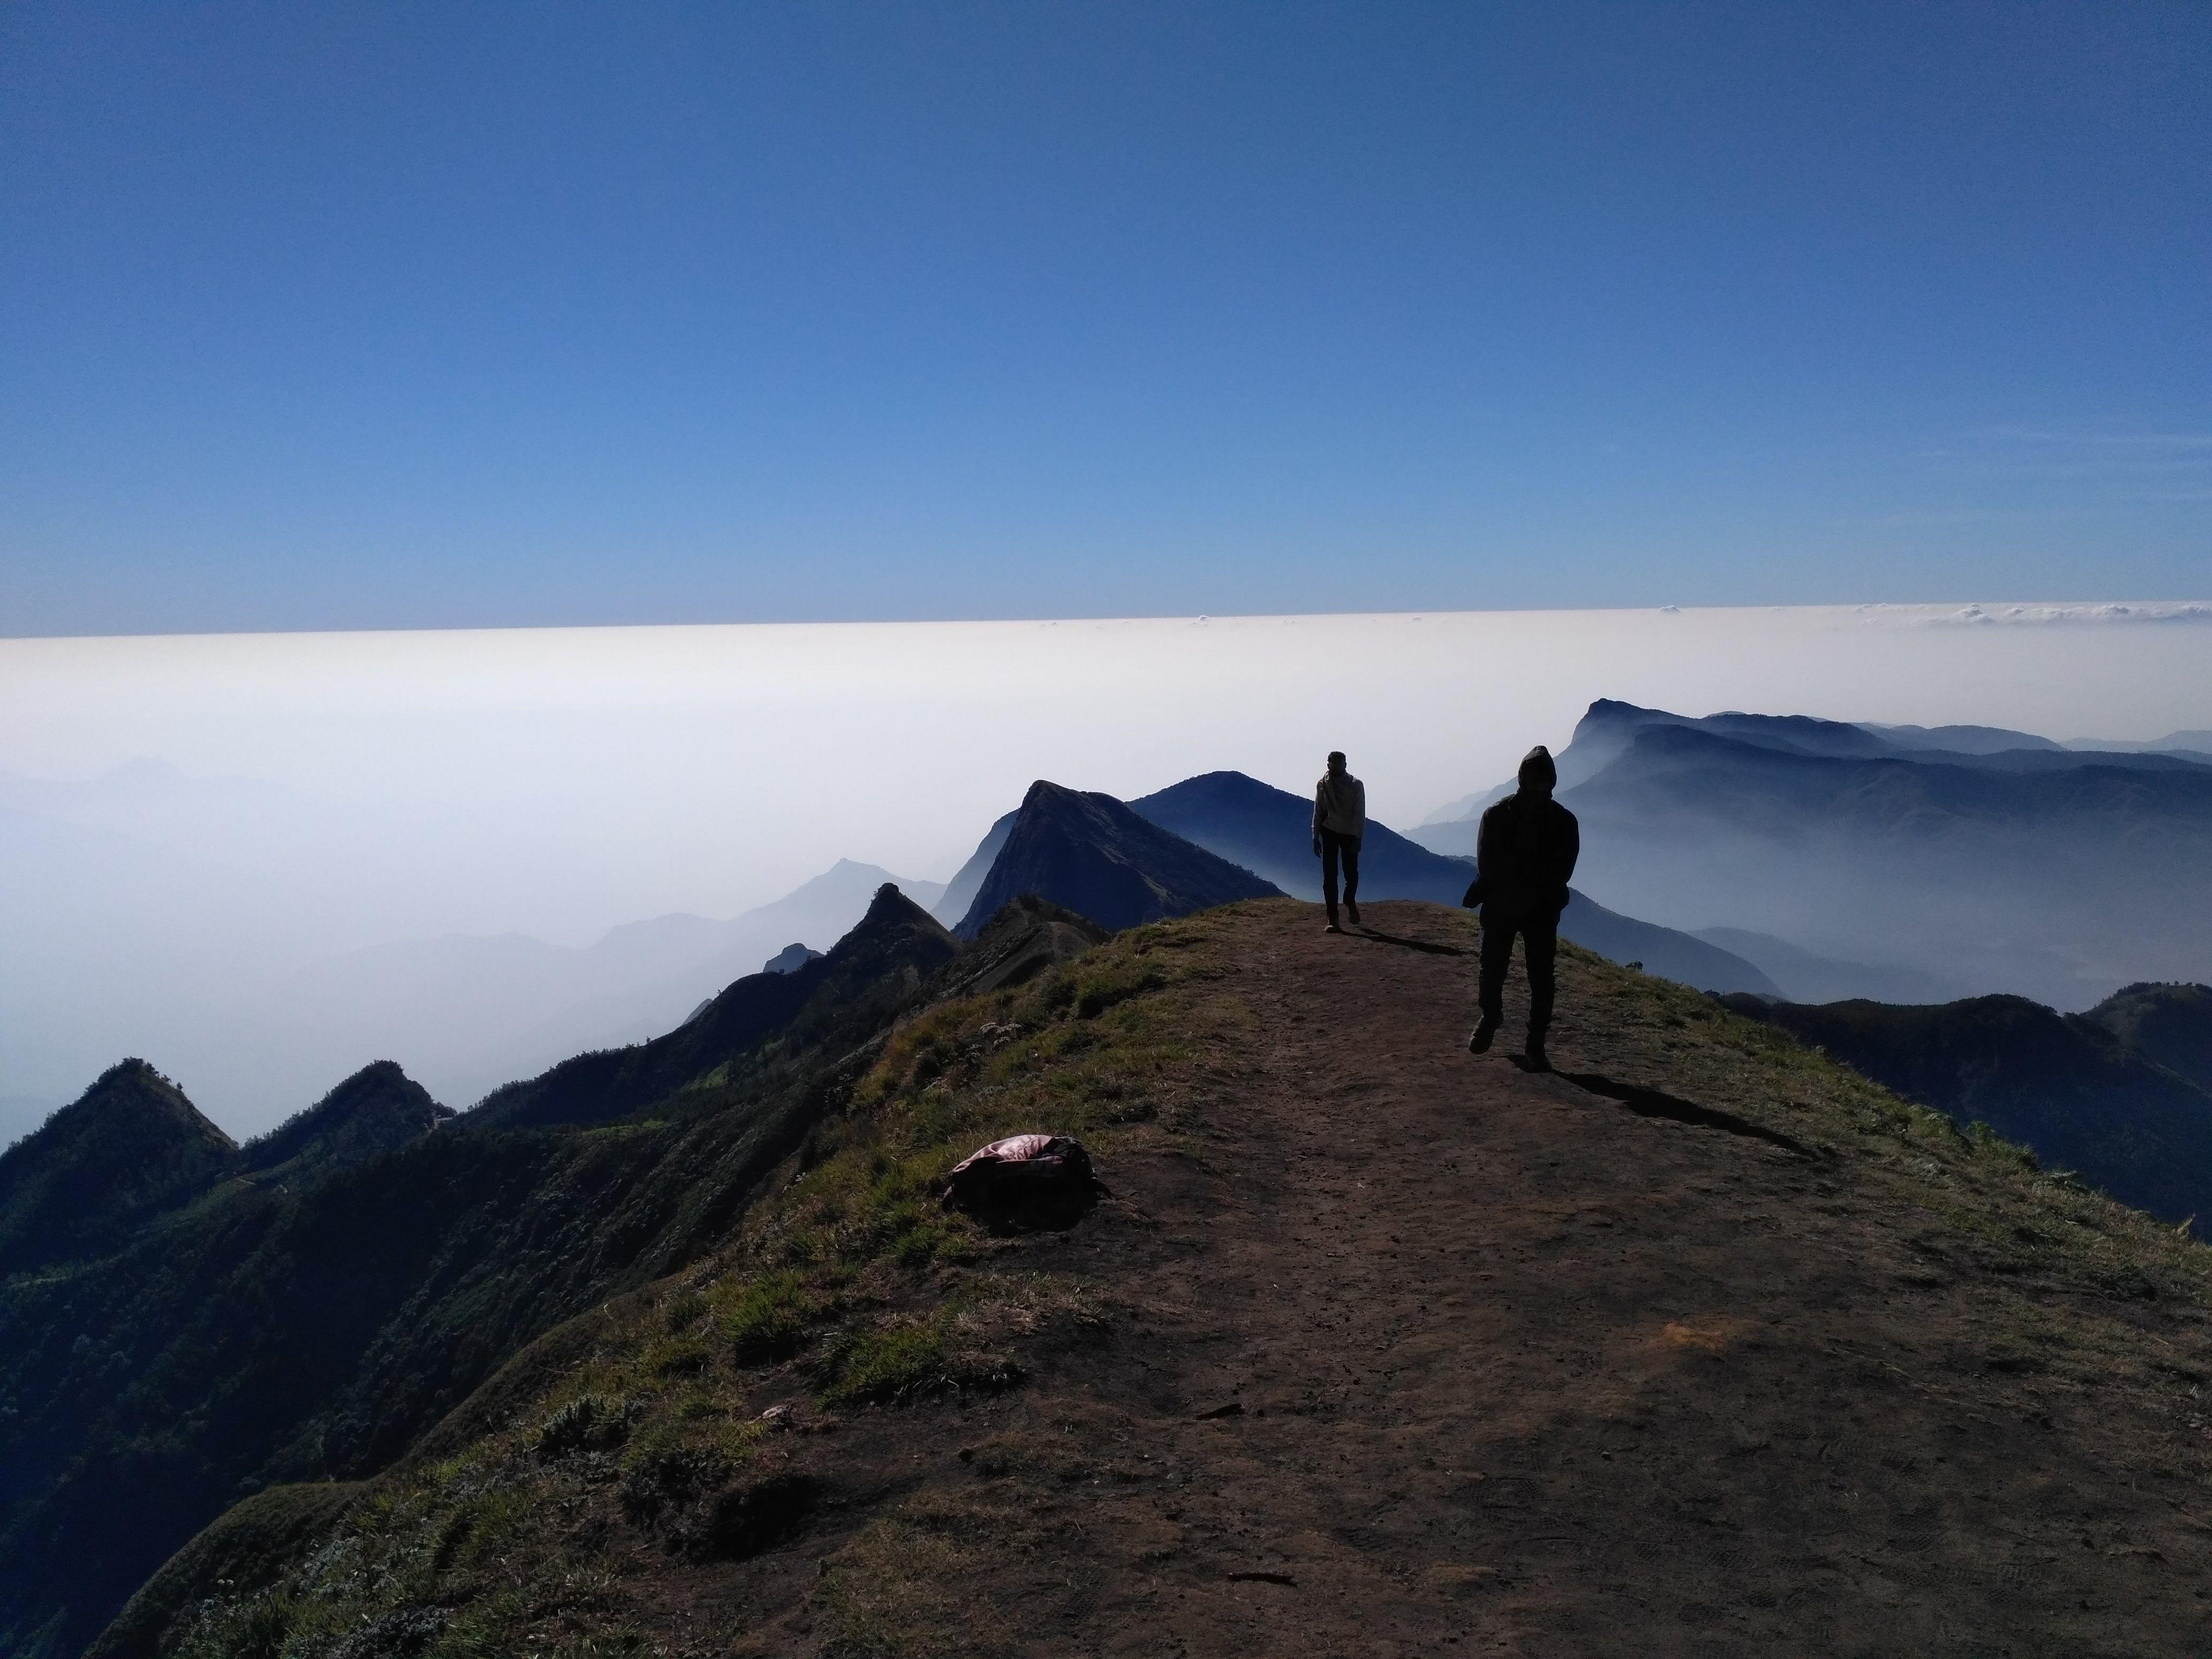 Meesapulimala Hike through cloud cladded peaks and